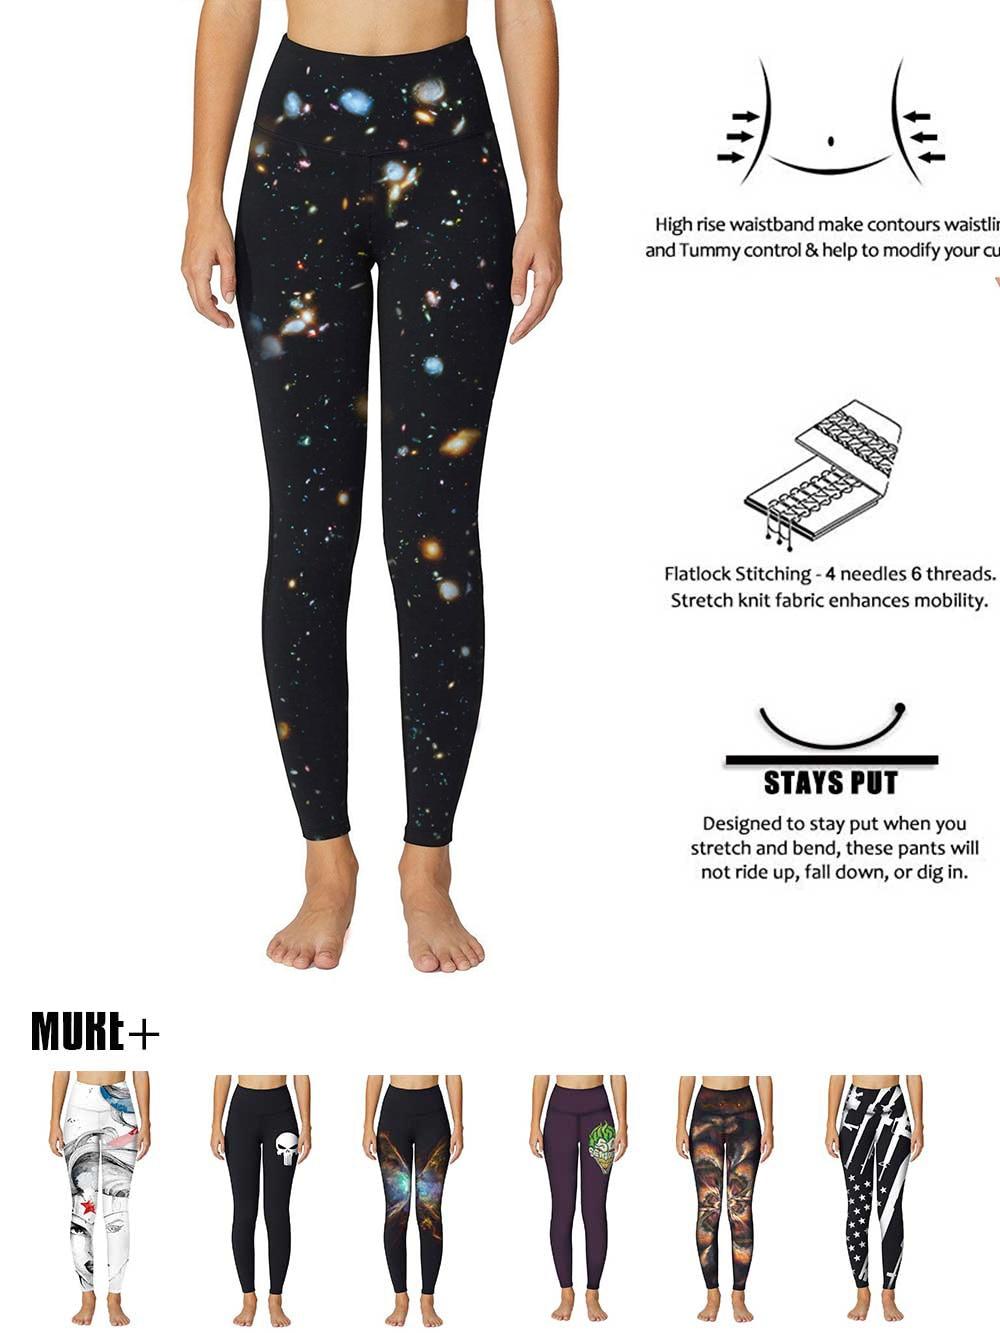 High Quality Universe Galaxies Women's Digital Printed Yoga Capris High Waist Workout Pants Moisture Wicking Running Leggings 3